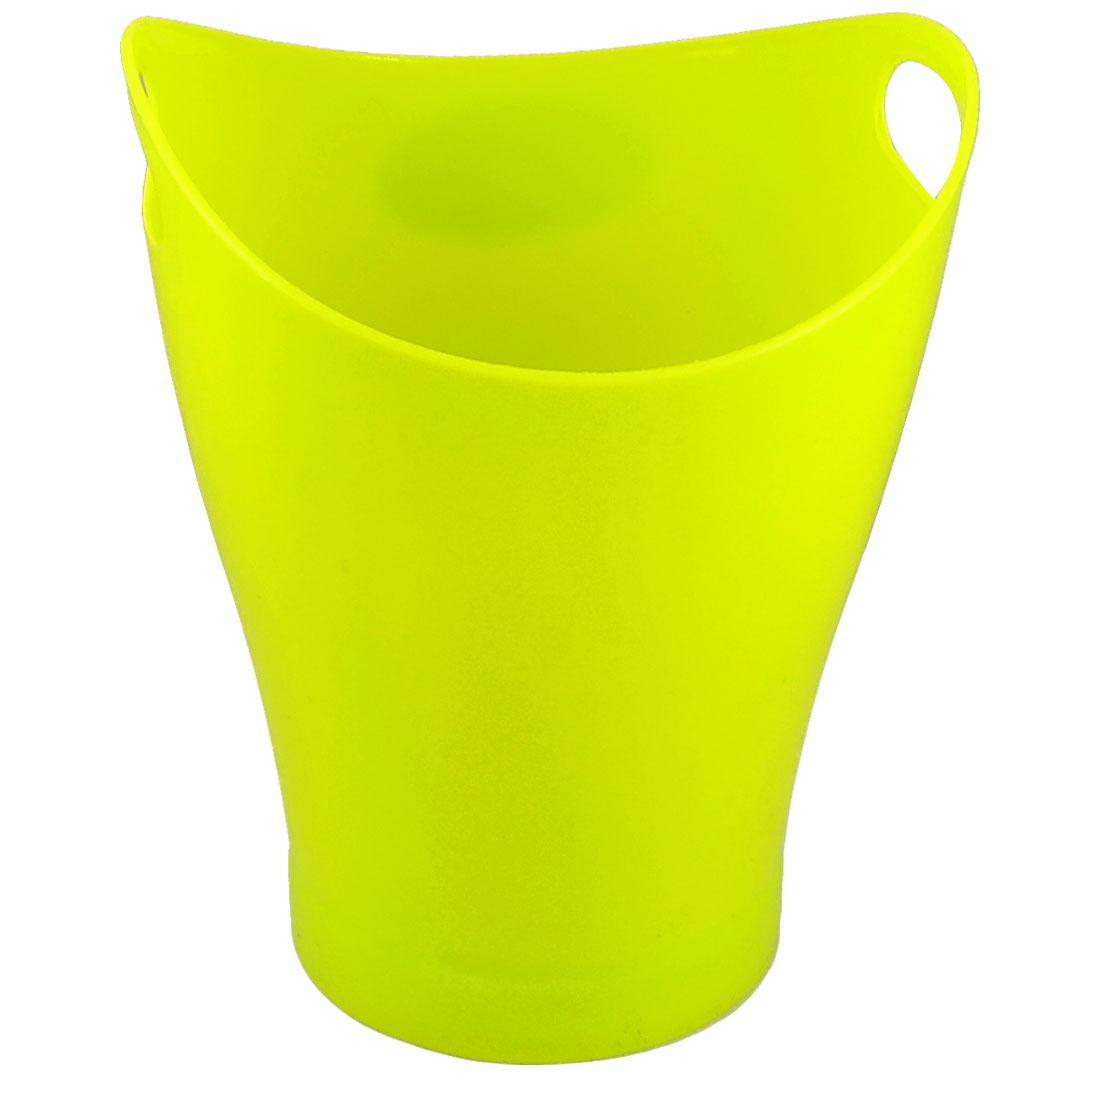 Desk Two Holes Yellowgreen Plastic Garbage Littler Bin